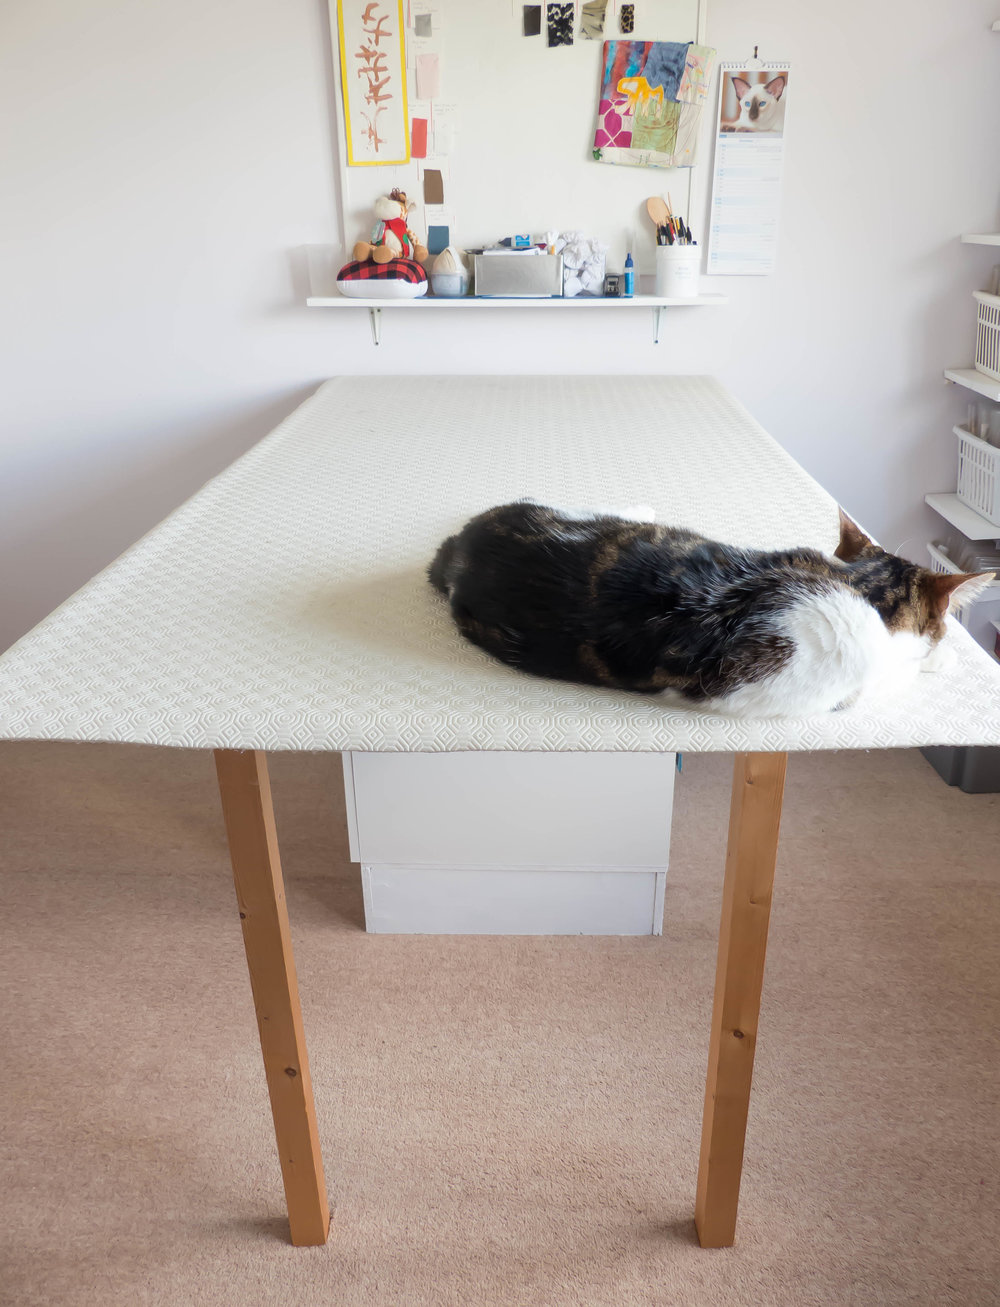 DIY folding cutting table with storage